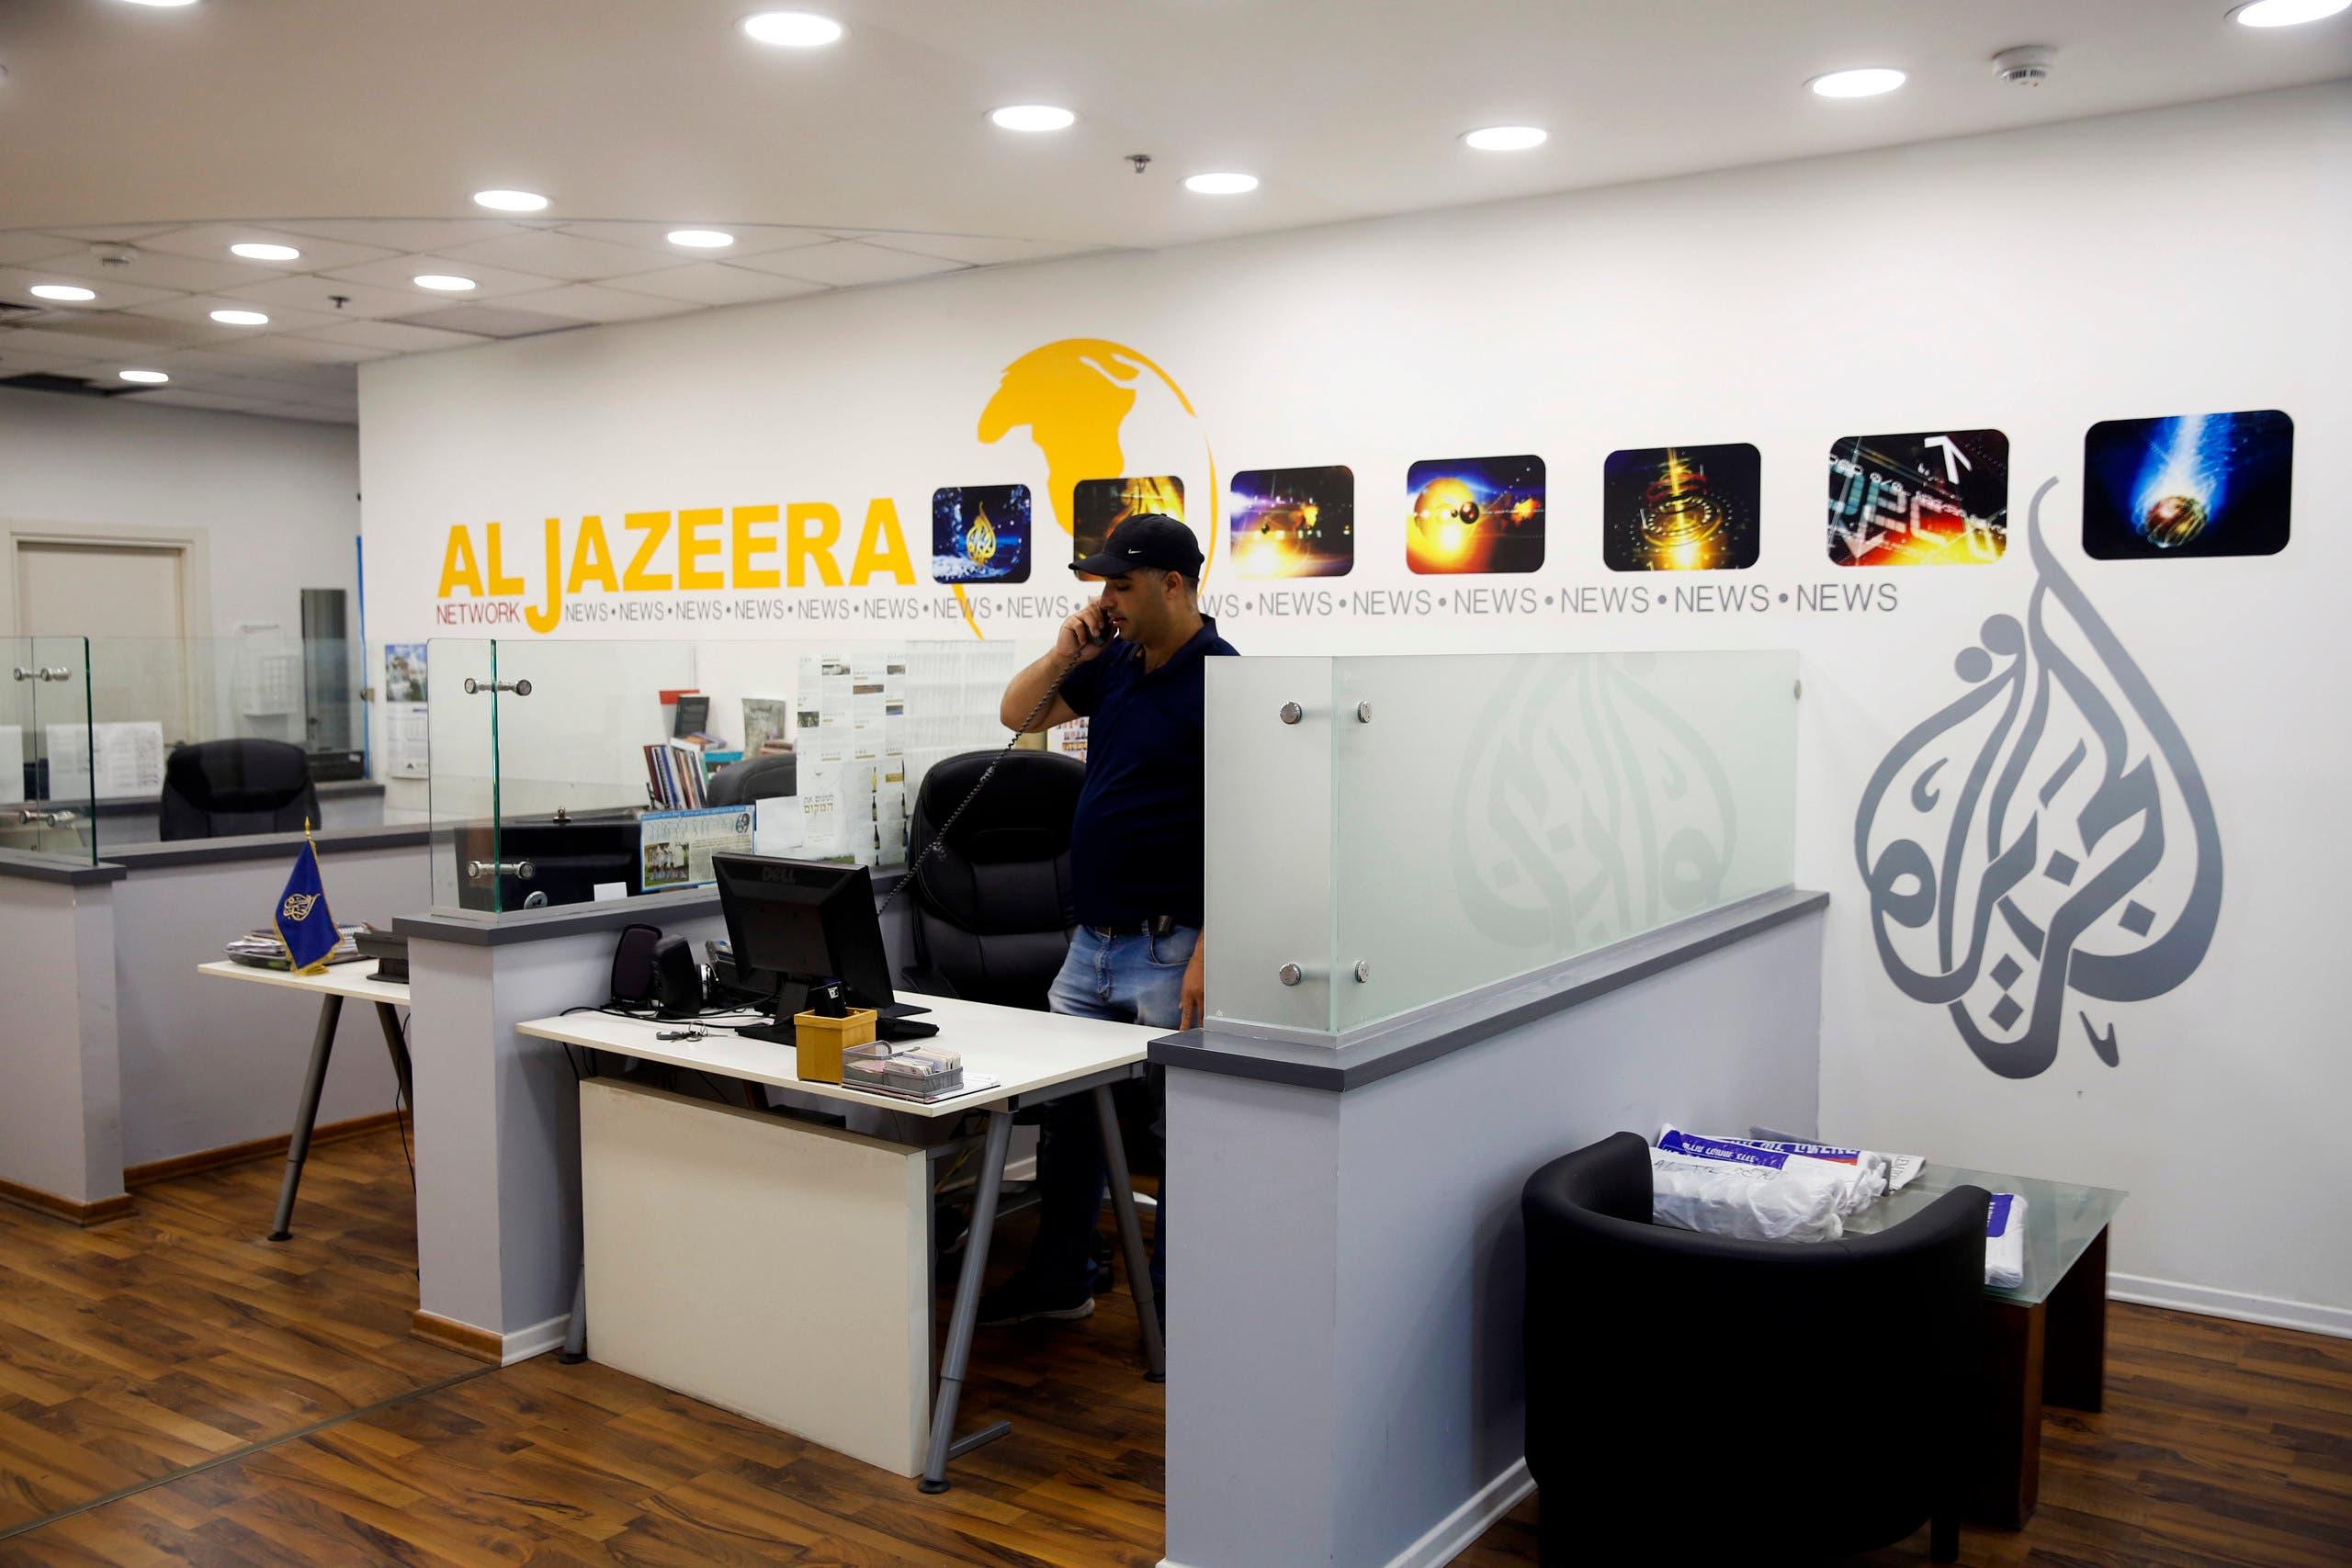 An employee talks on the phone in Al-Jazeera news network offices in Jerusalem. (File photo: AP)